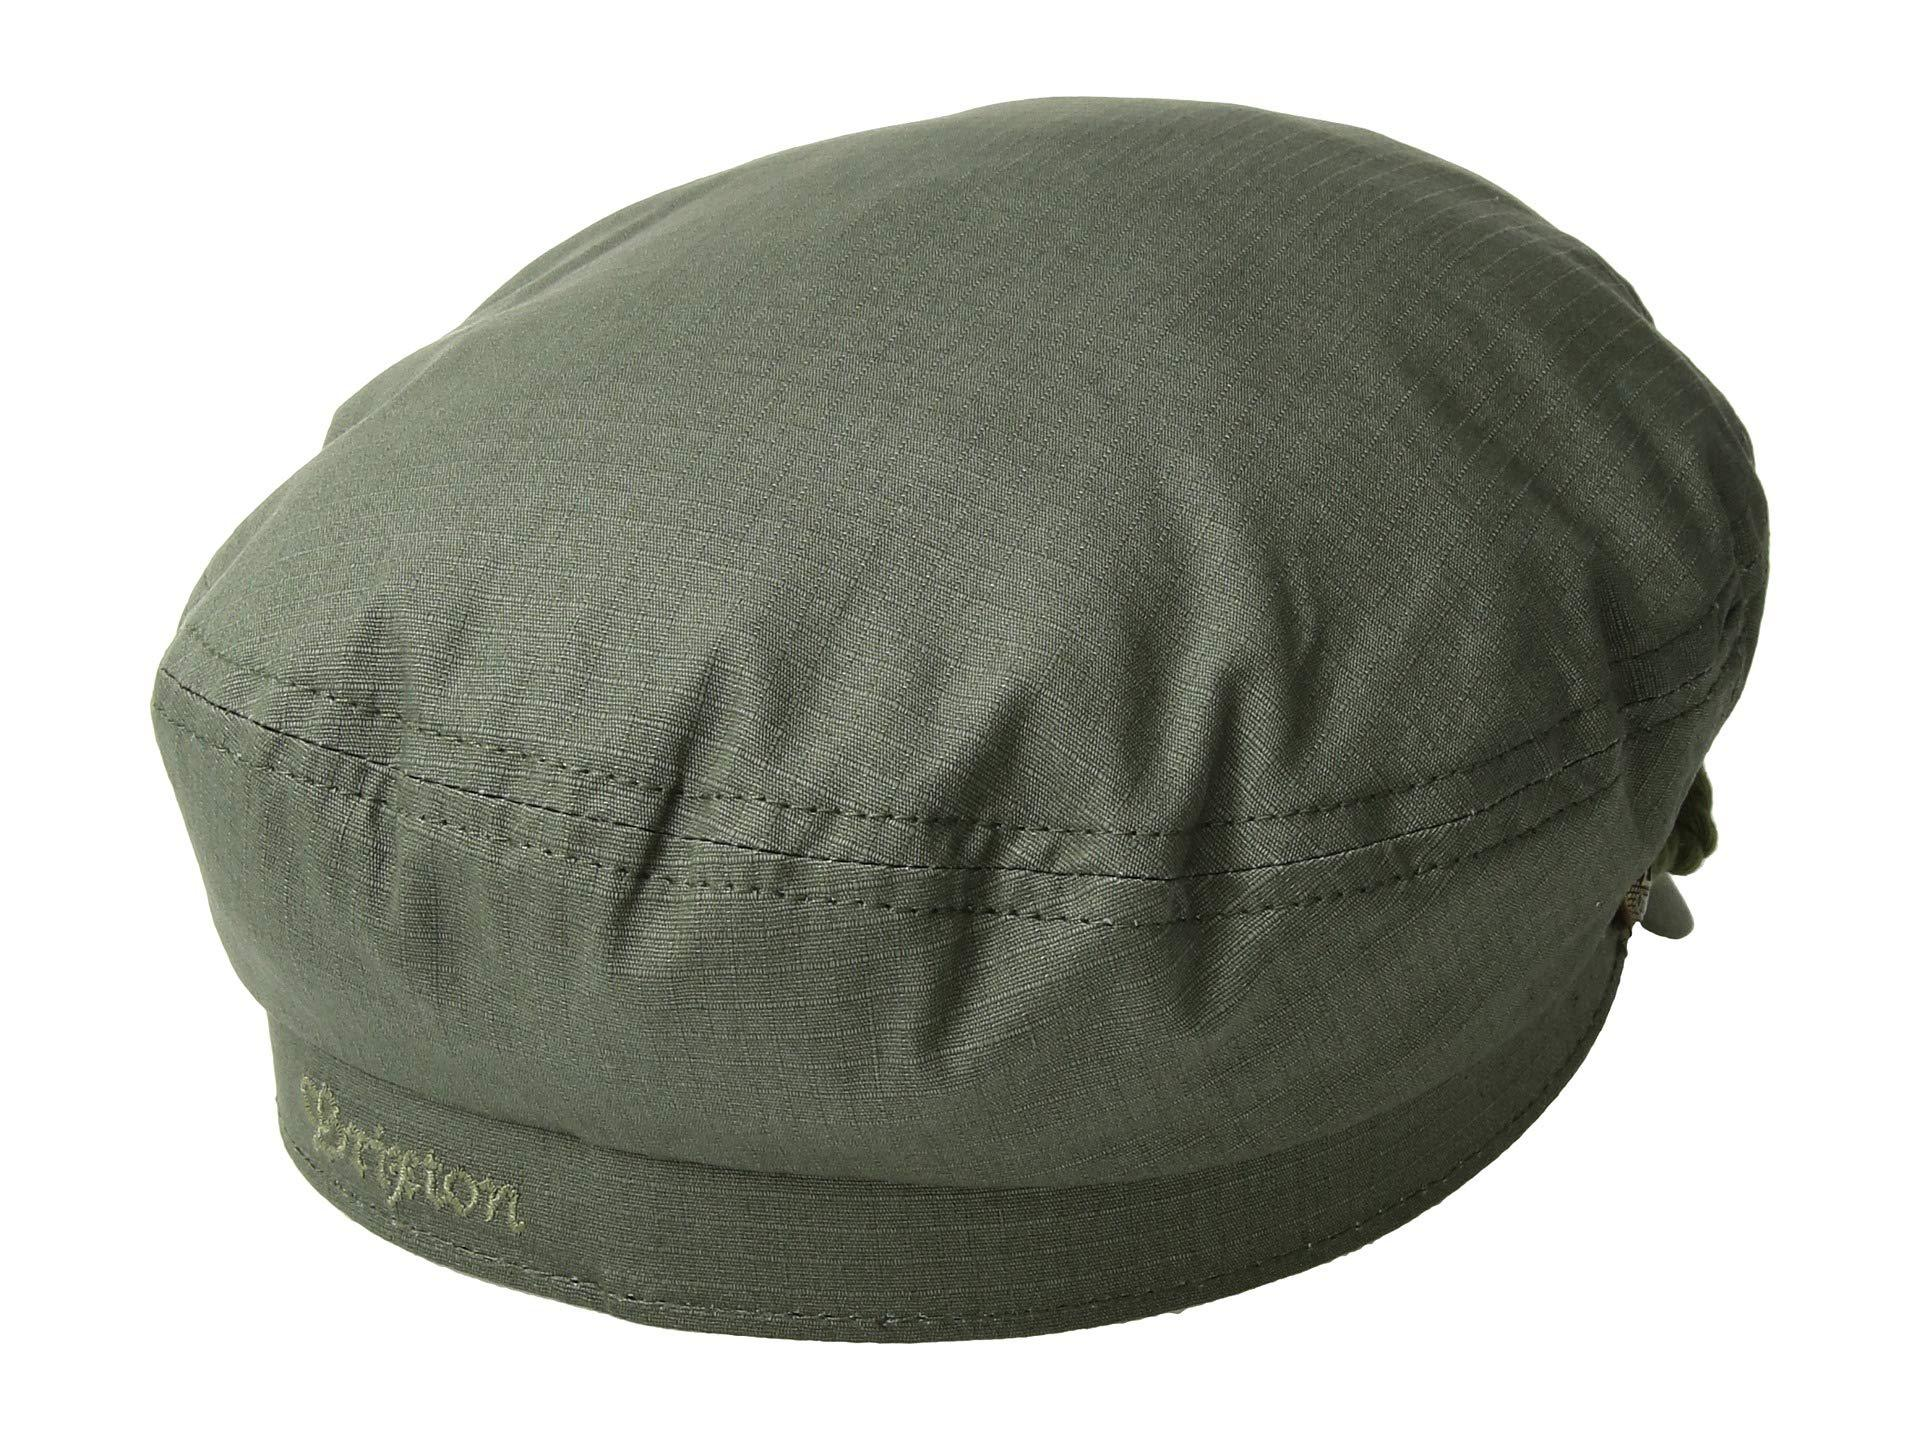 Brixton - Green Fiddler (black Herringbone Twill) Traditional Hats for Men  - Lyst. View fullscreen 4673c8d93d84